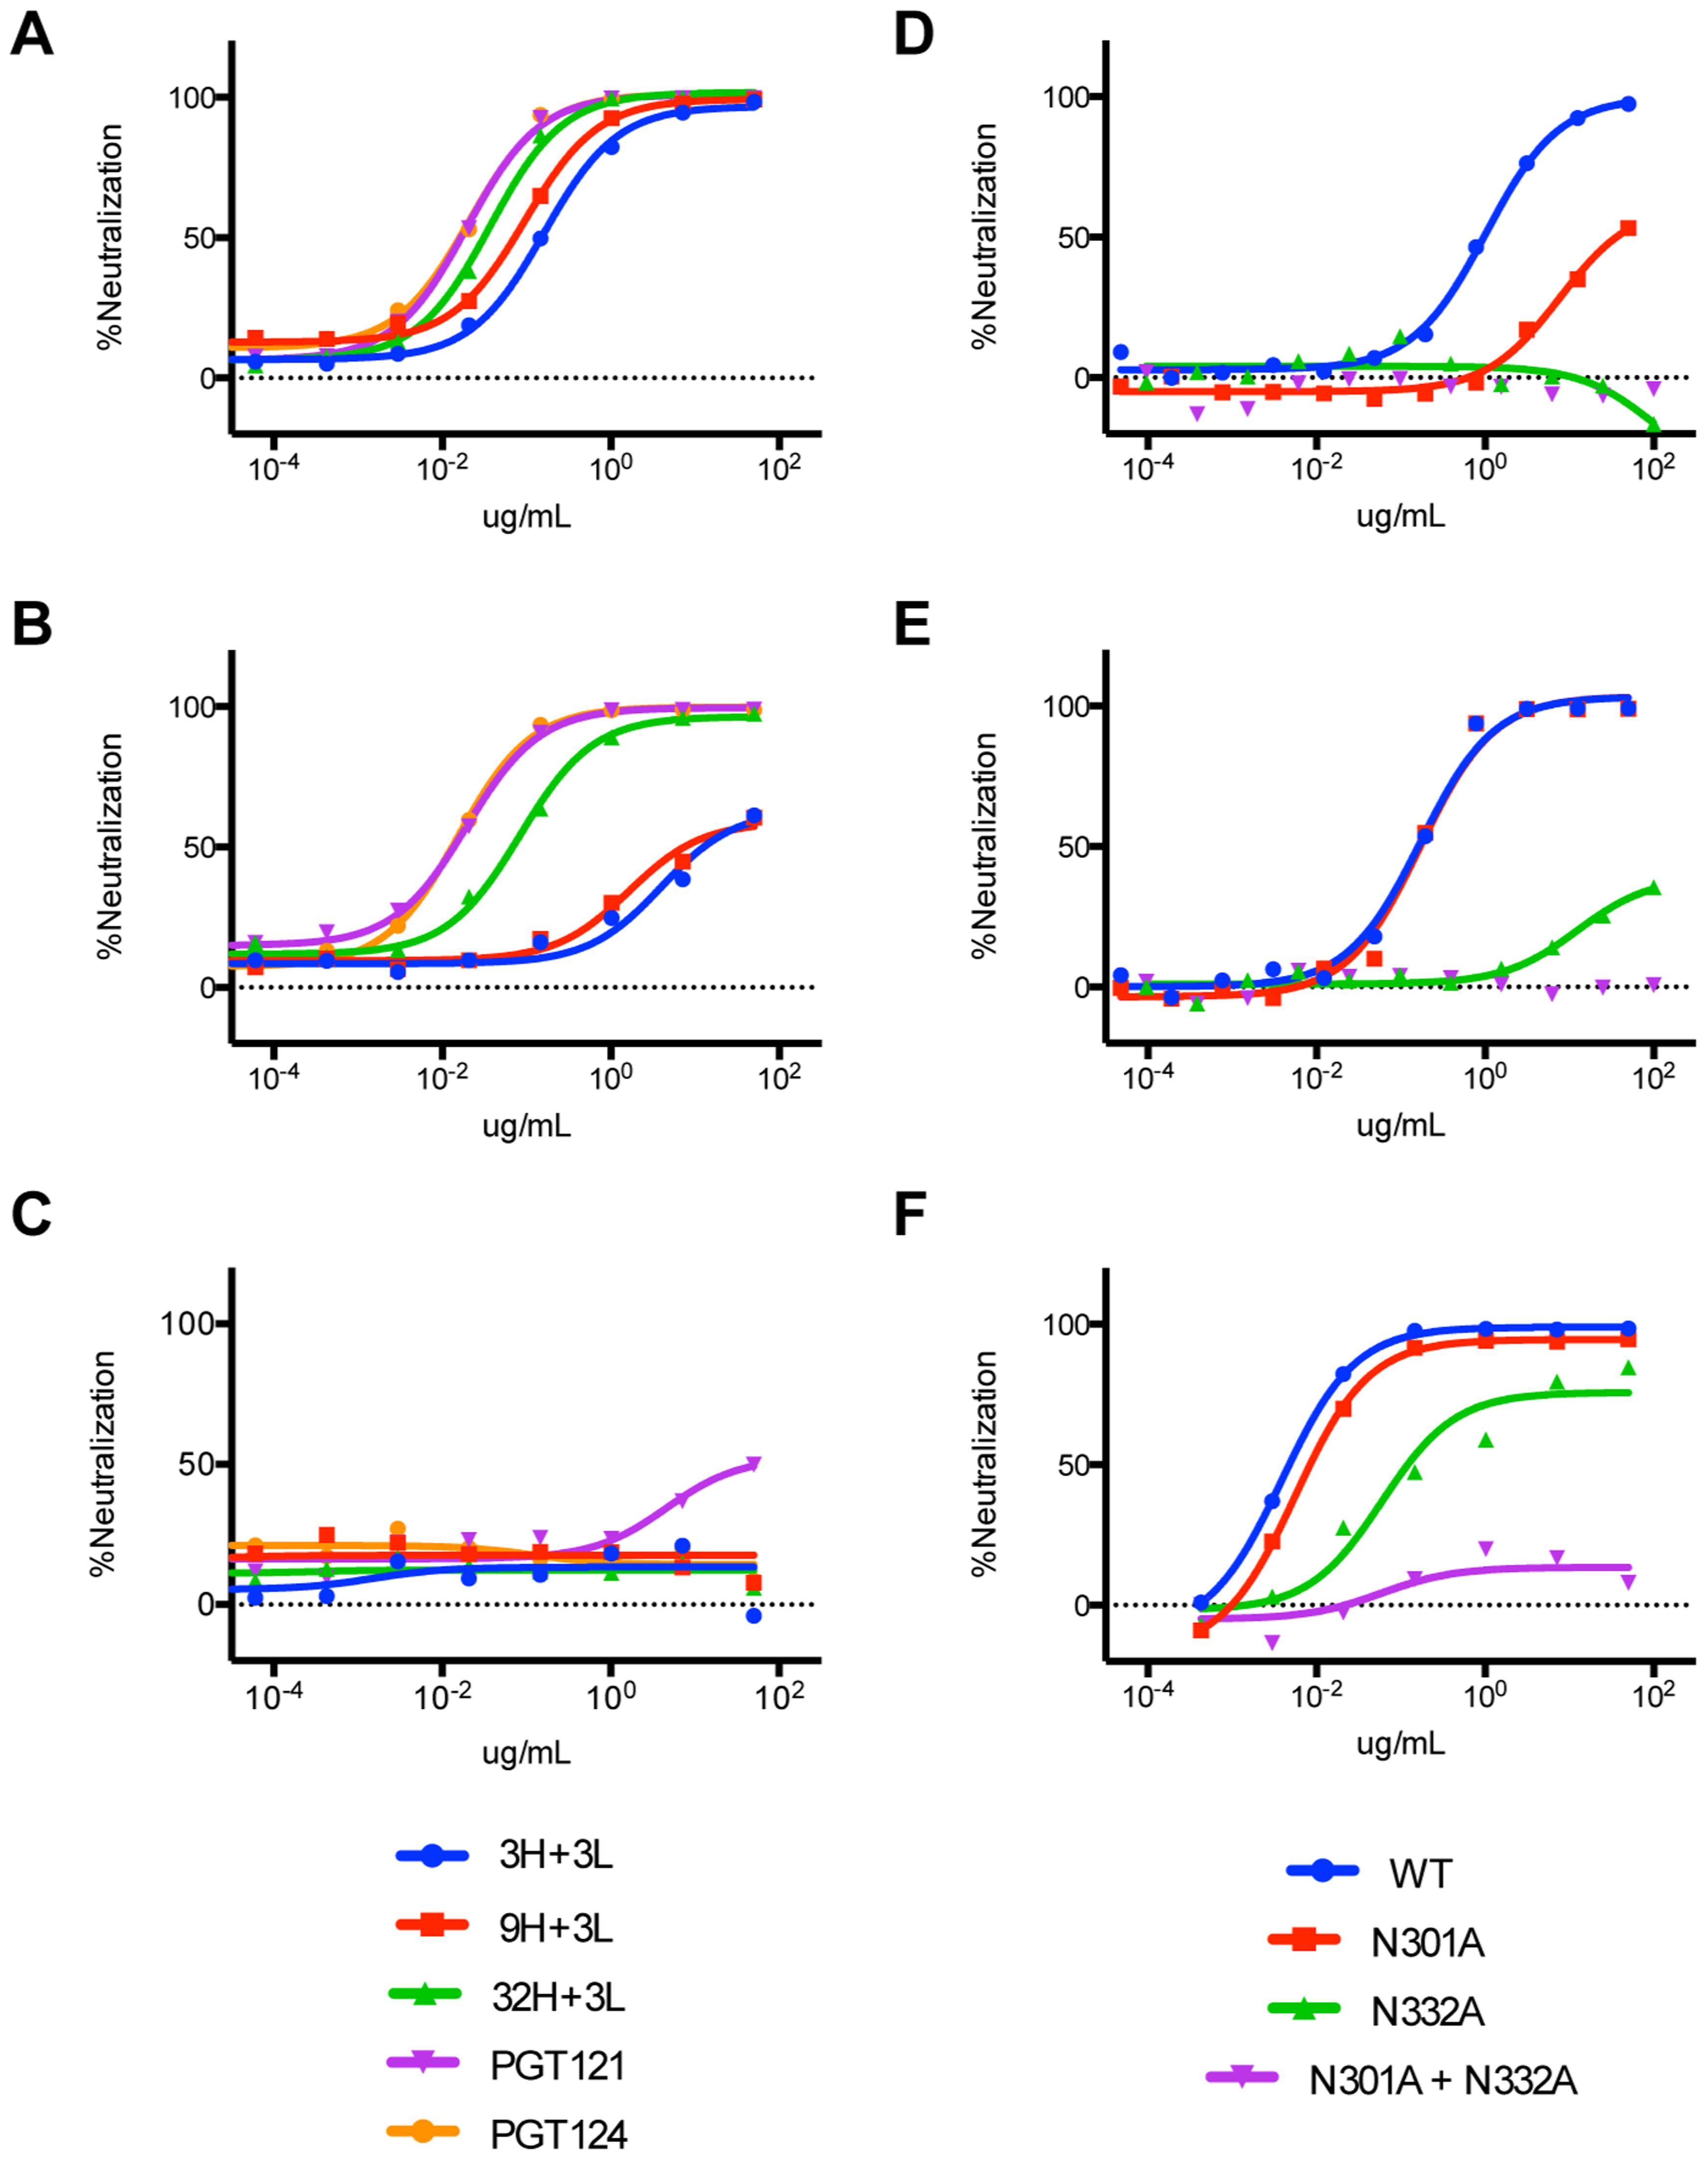 Neutralization assays on JR-FL glycan mutants indicate binding of inferred intermediate antibodies to both N301 and N332 on HIV-1 Env.